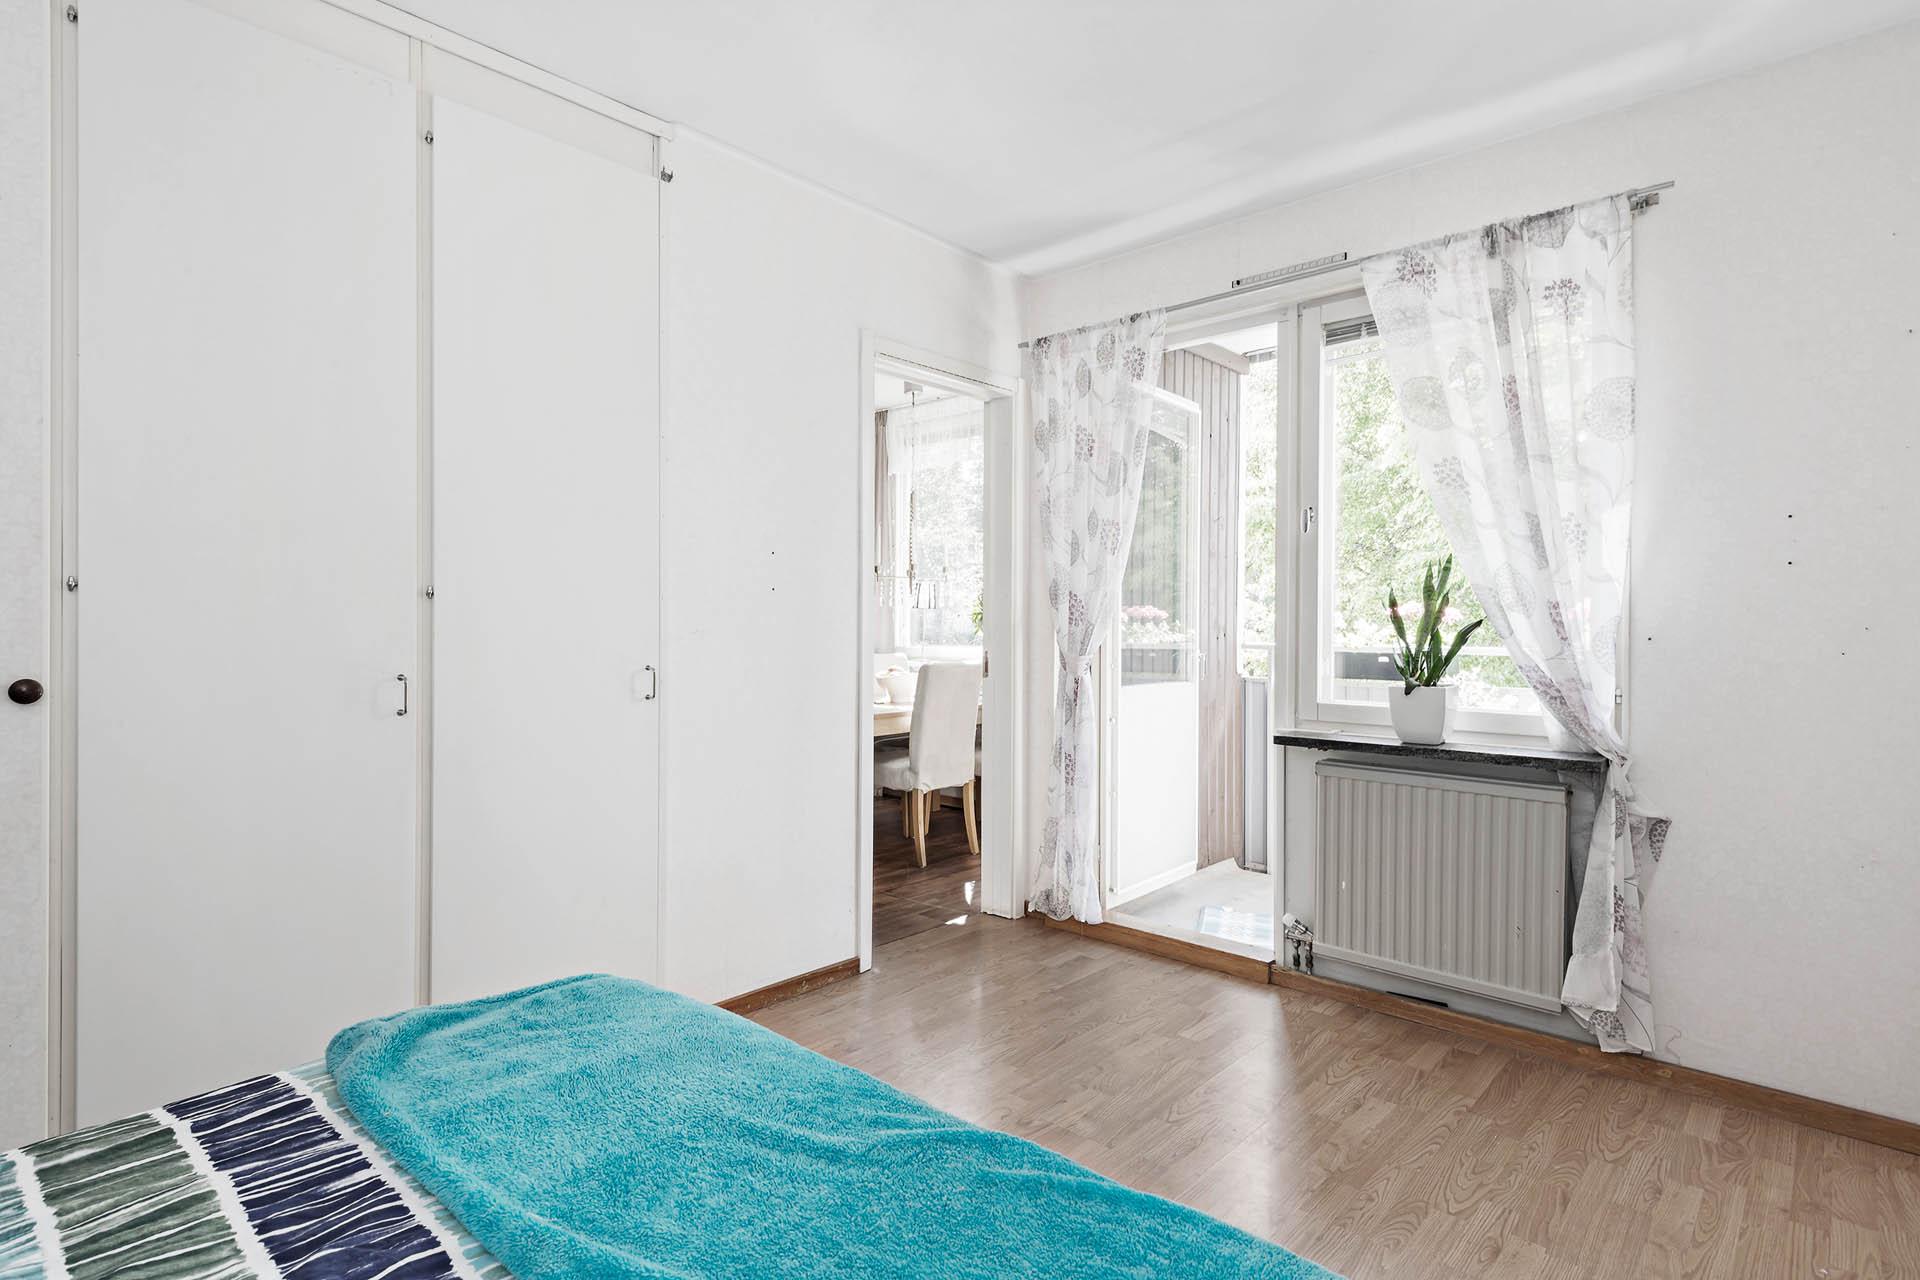 Sovrum 2 mot balkong och kök